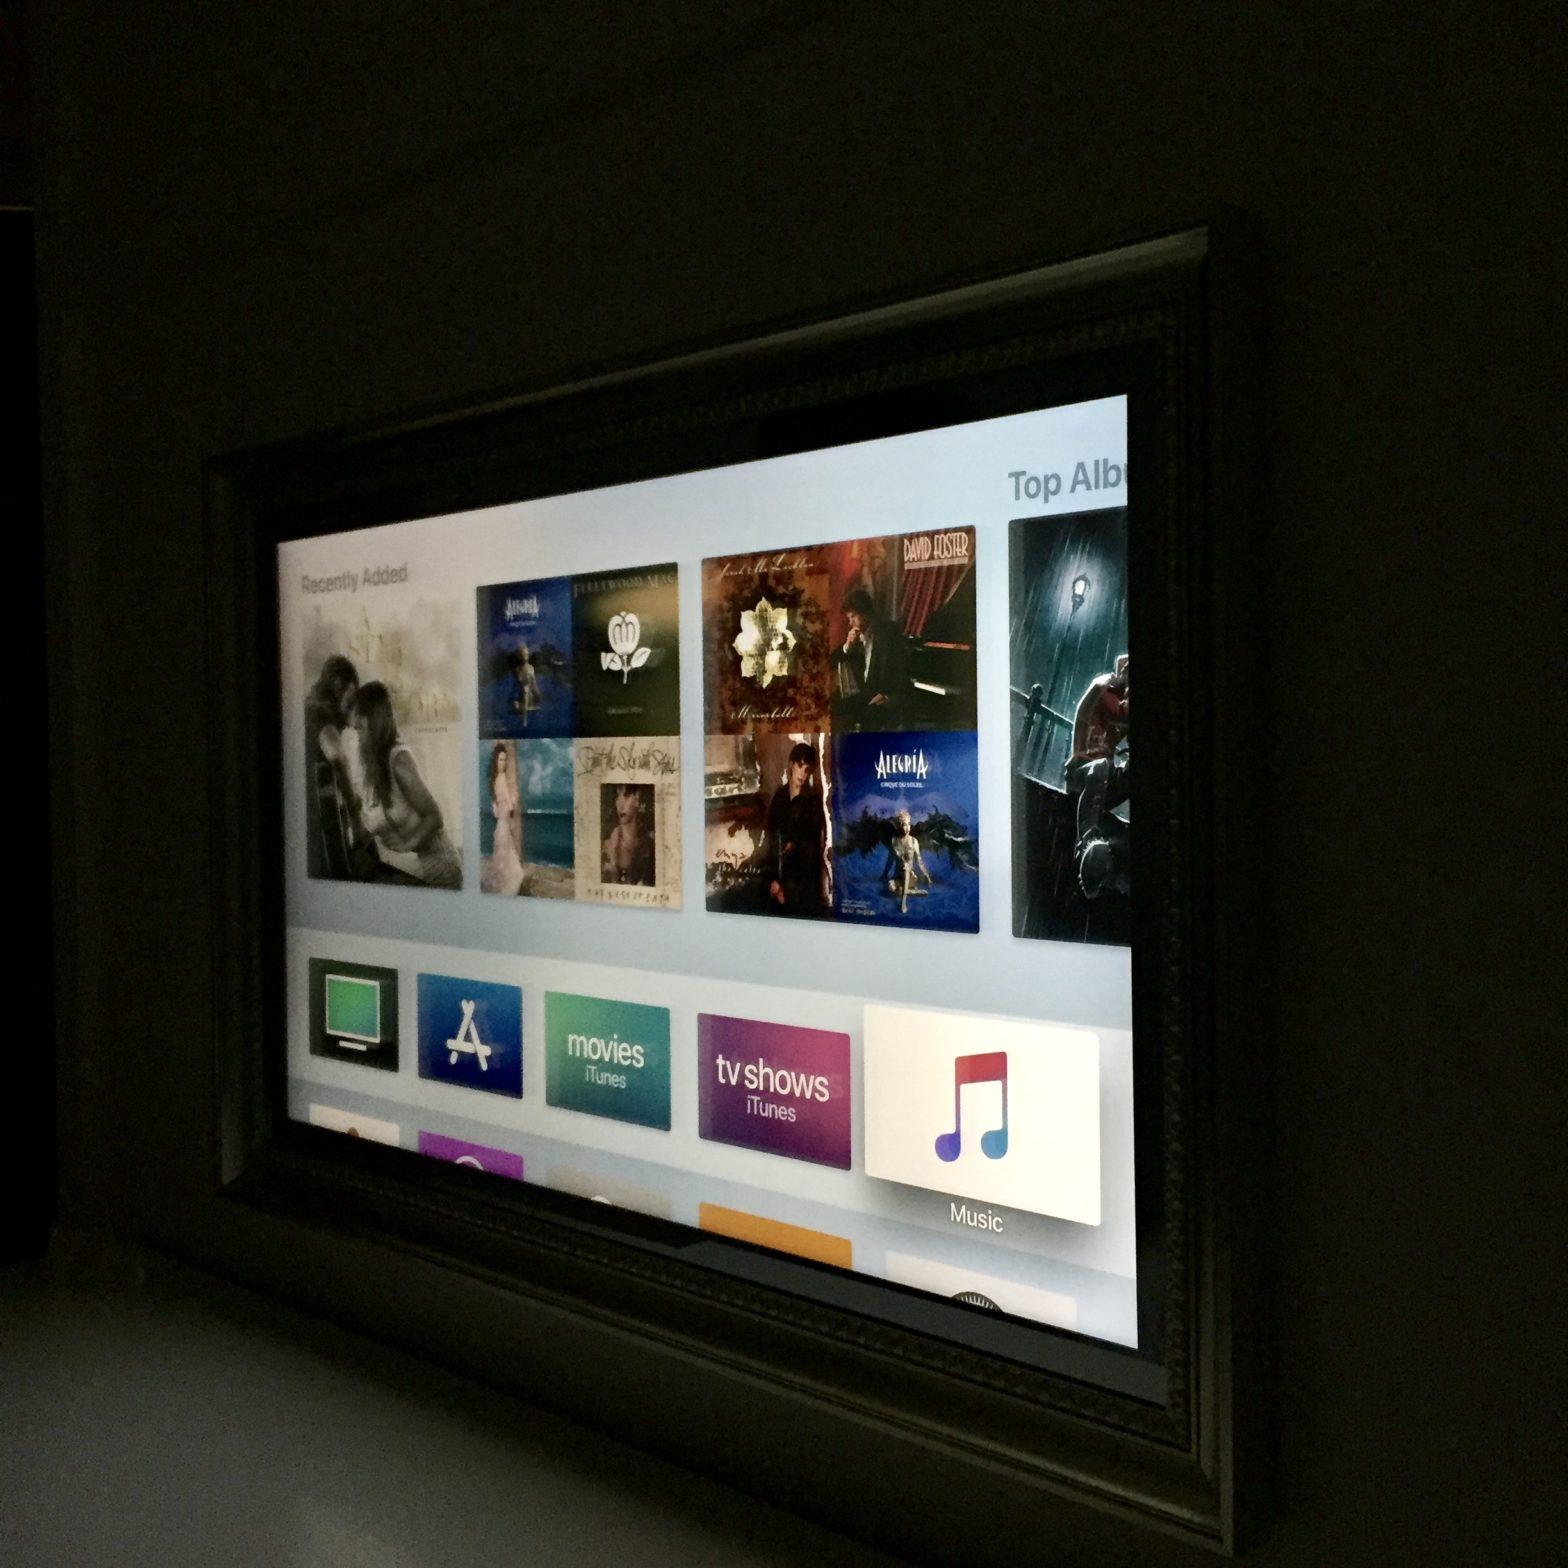 Mirror TV by night